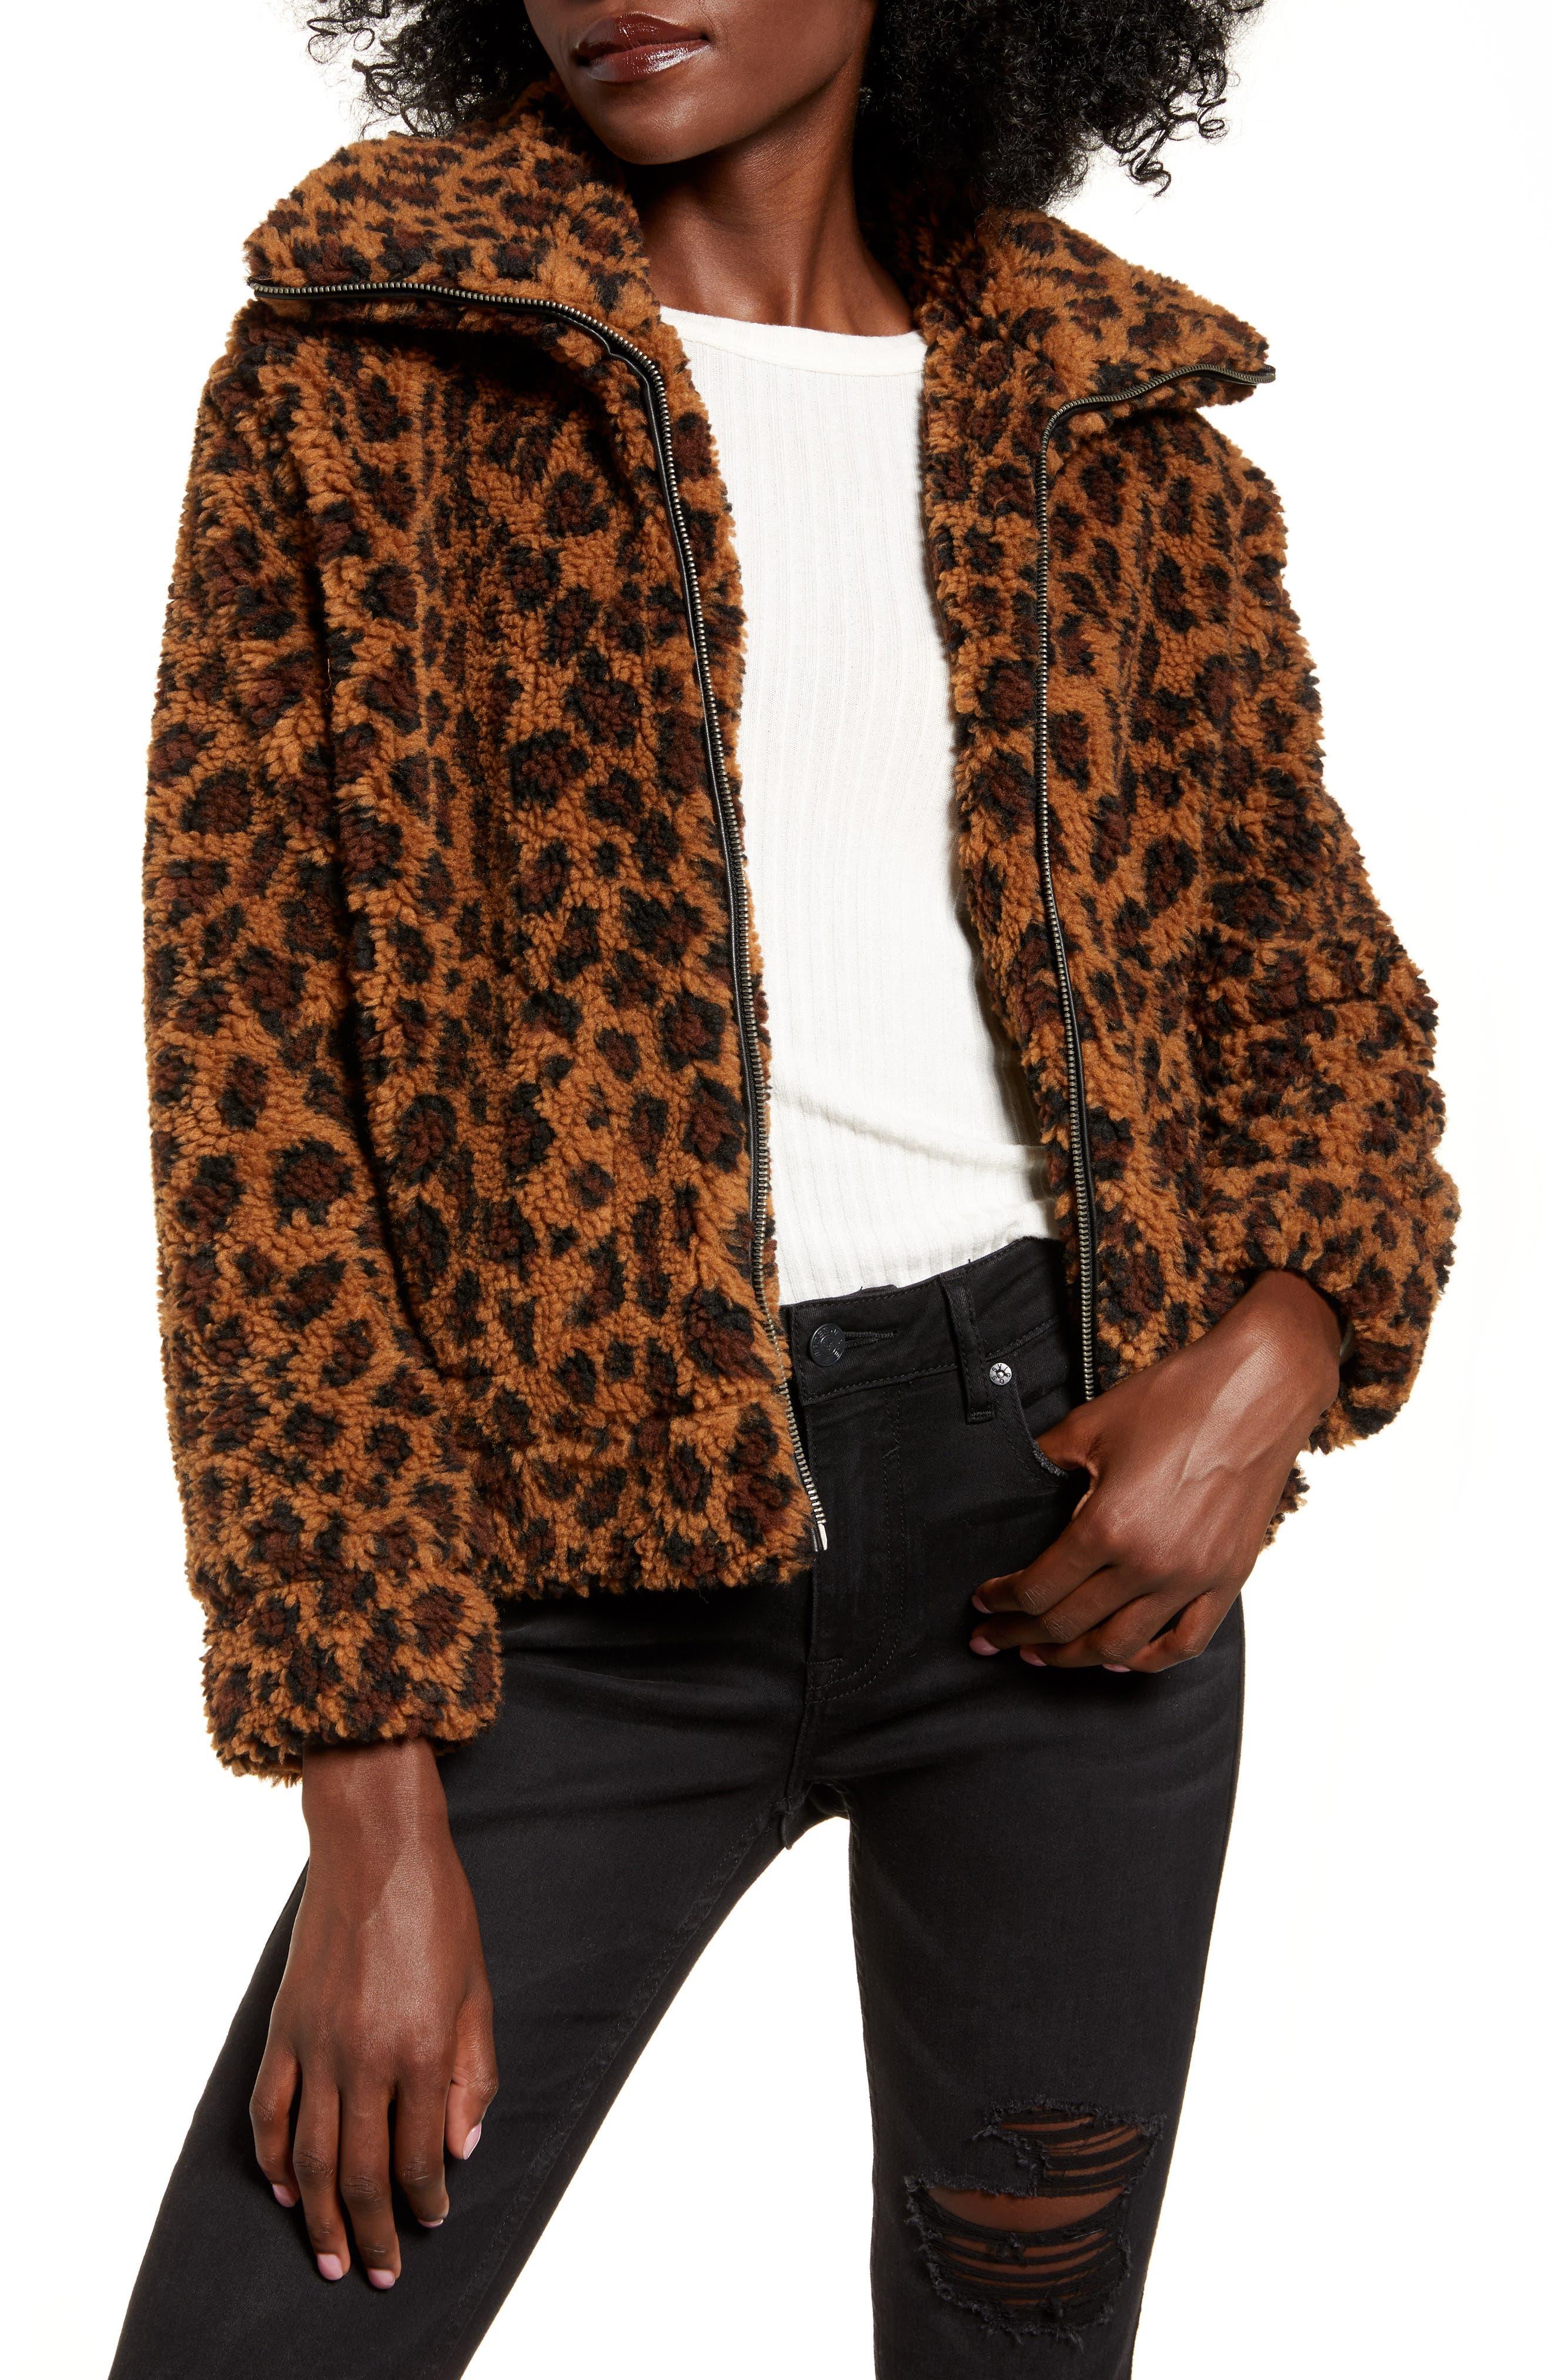 Image of BB Dakota Leopard Print Faux Shearling Jacket